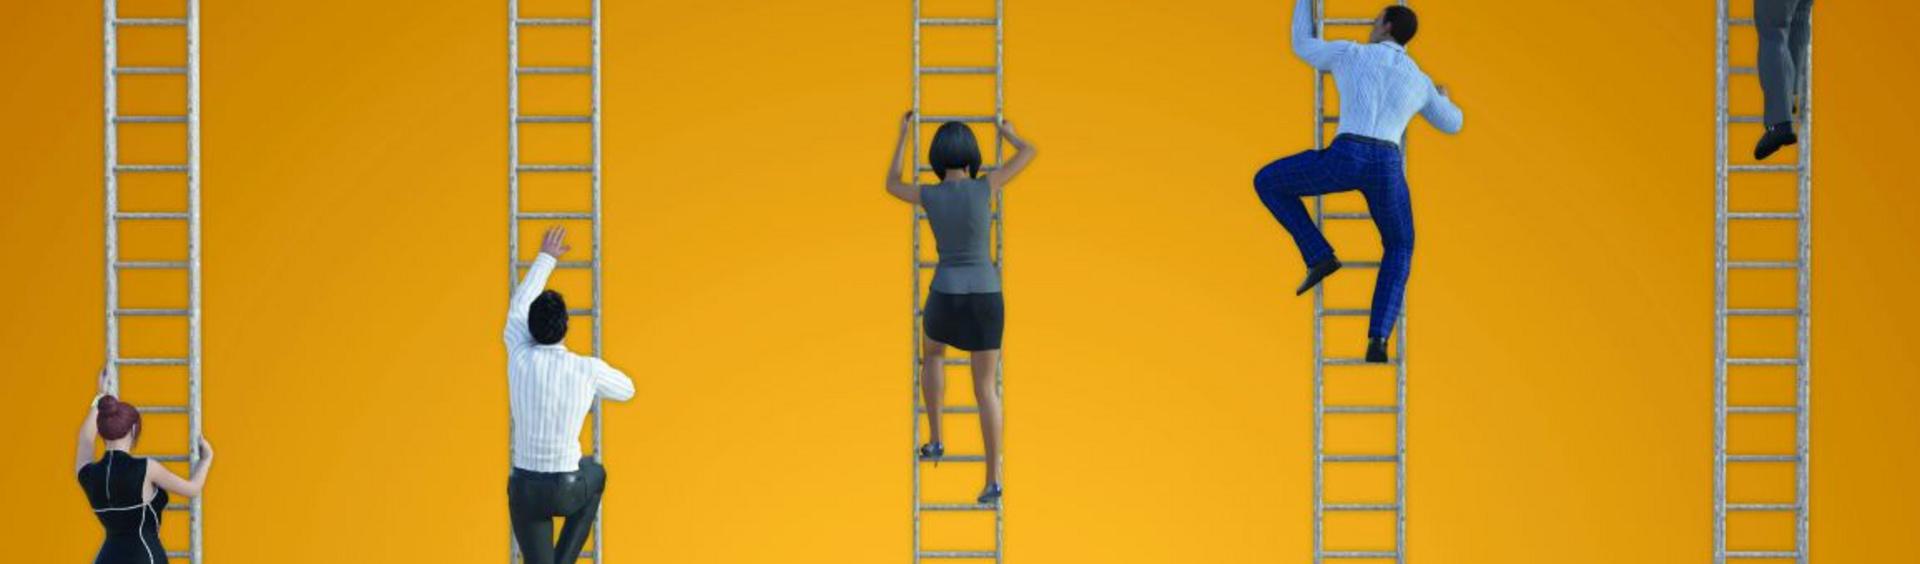 Climbing up ladders